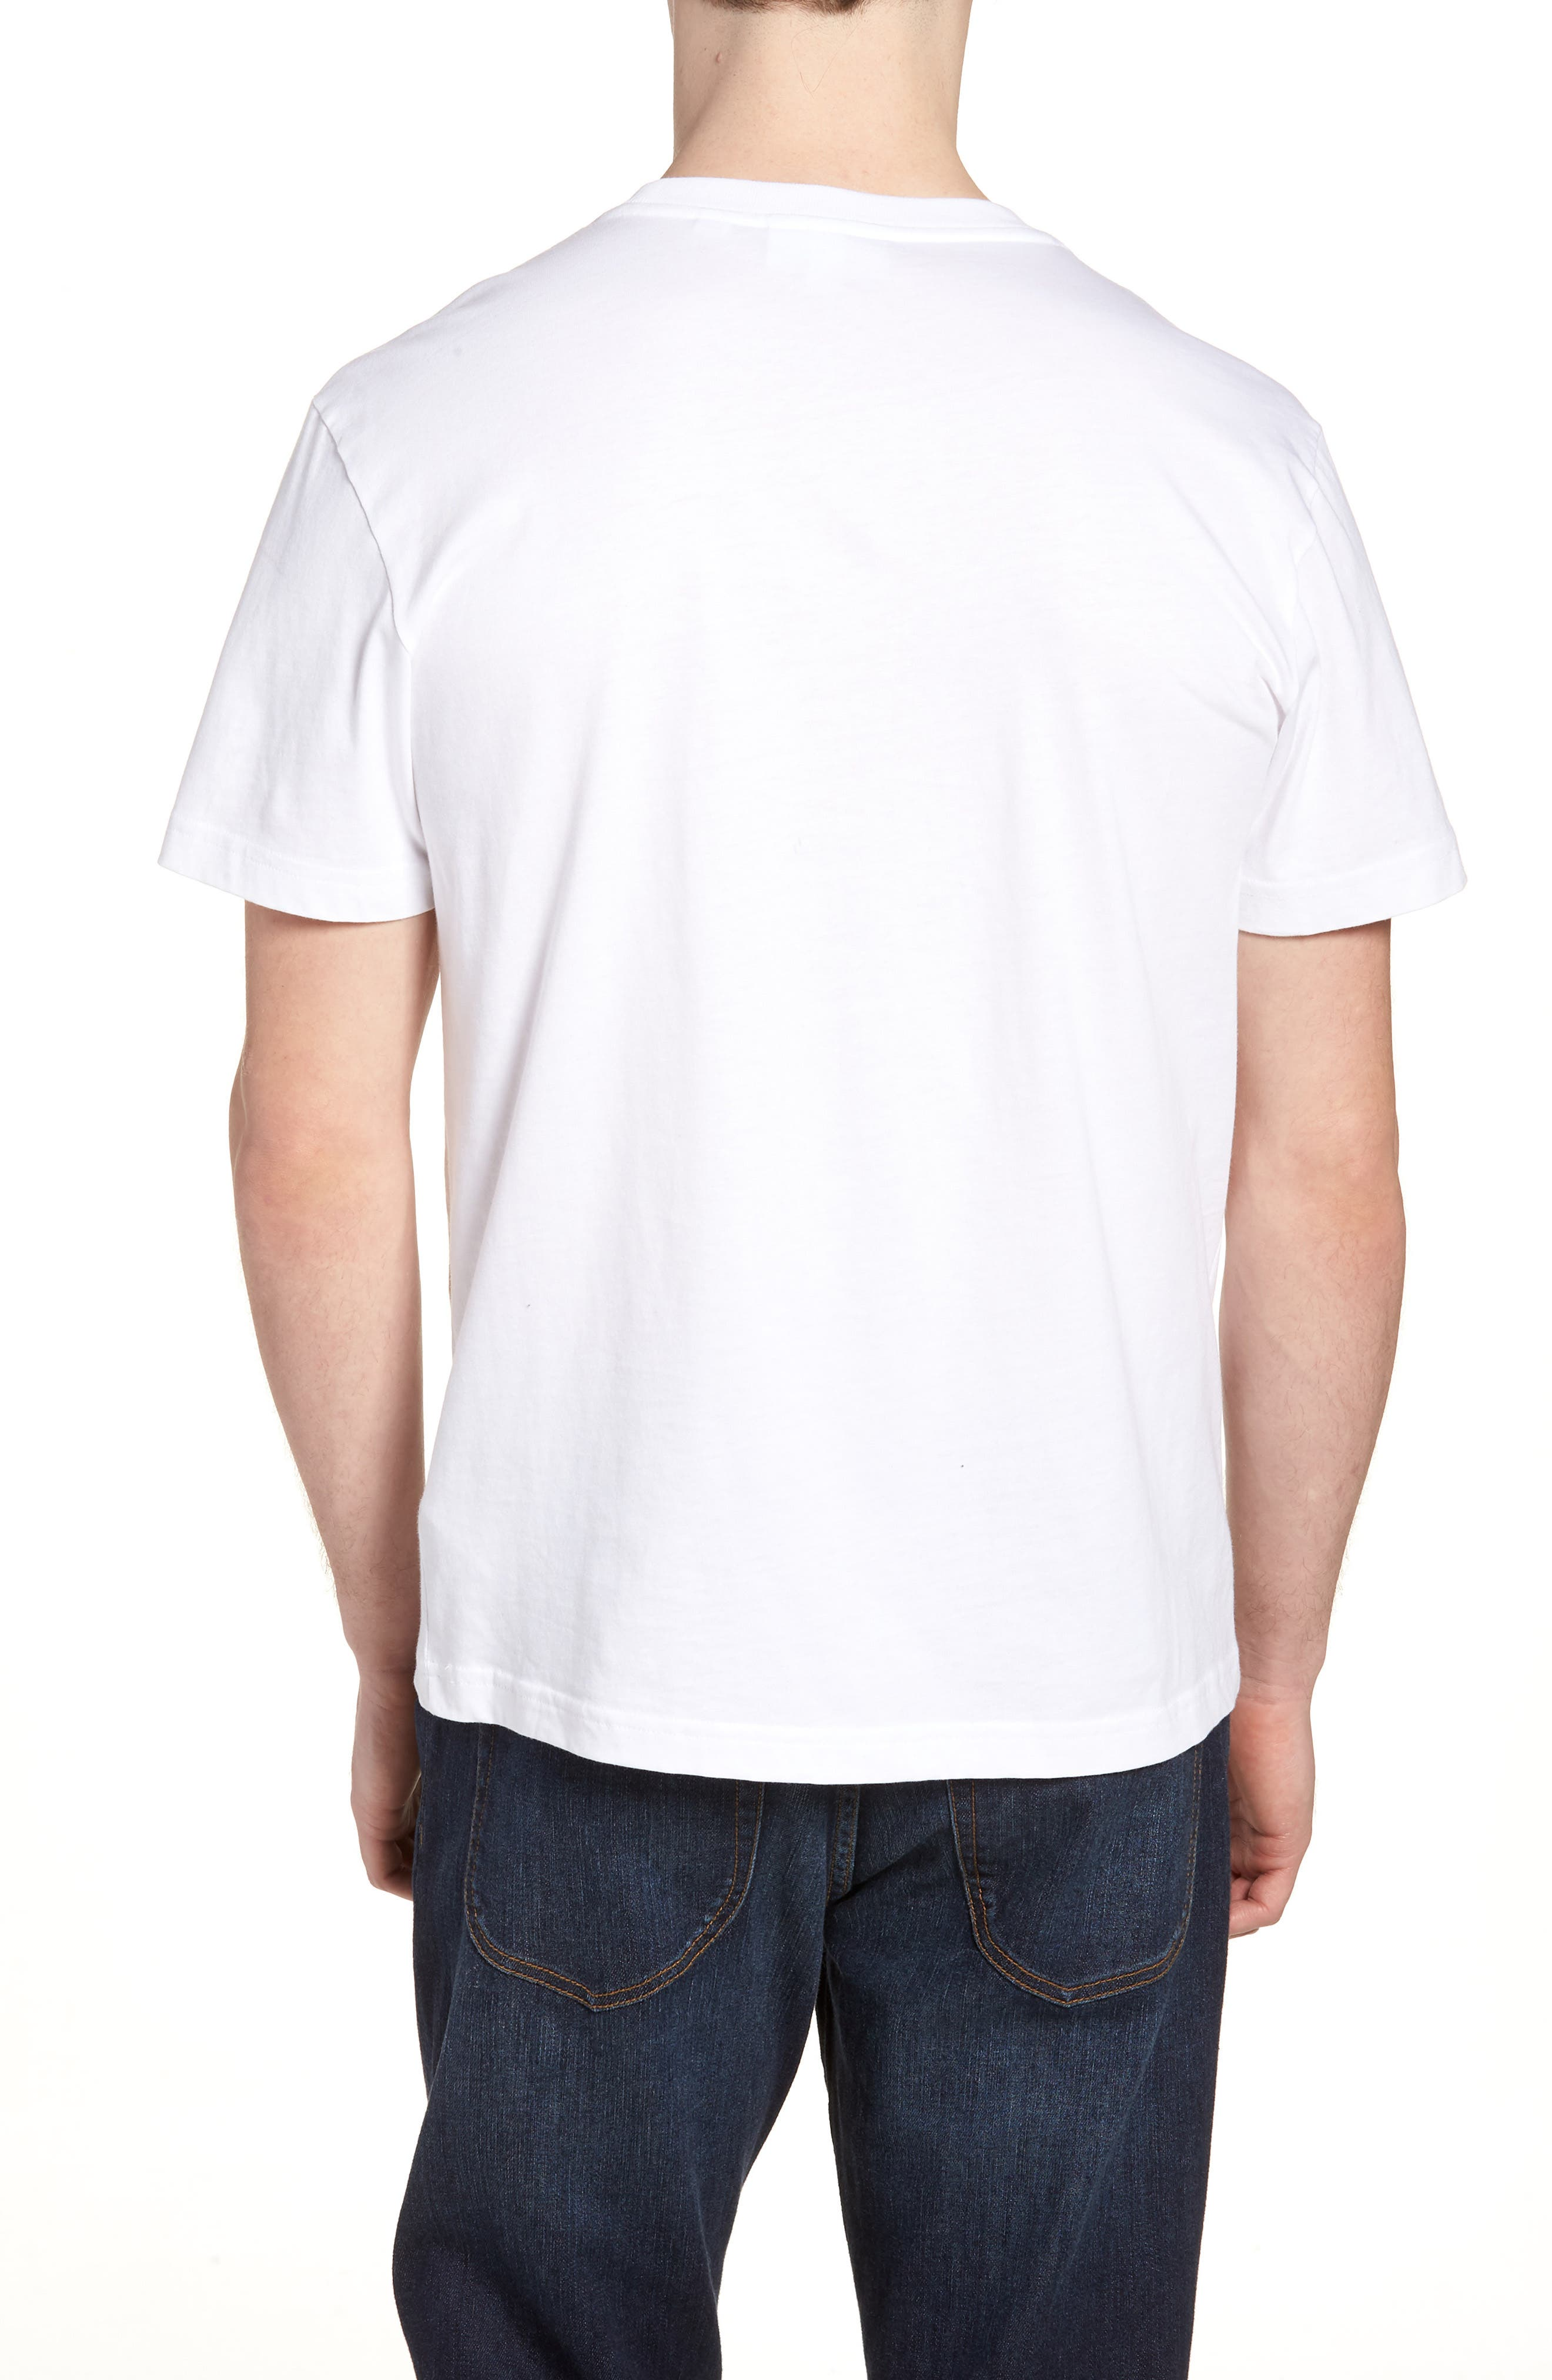 Crocodile T-Shirt,                             Alternate thumbnail 2, color,                             WHITE/ NAVY BLUE